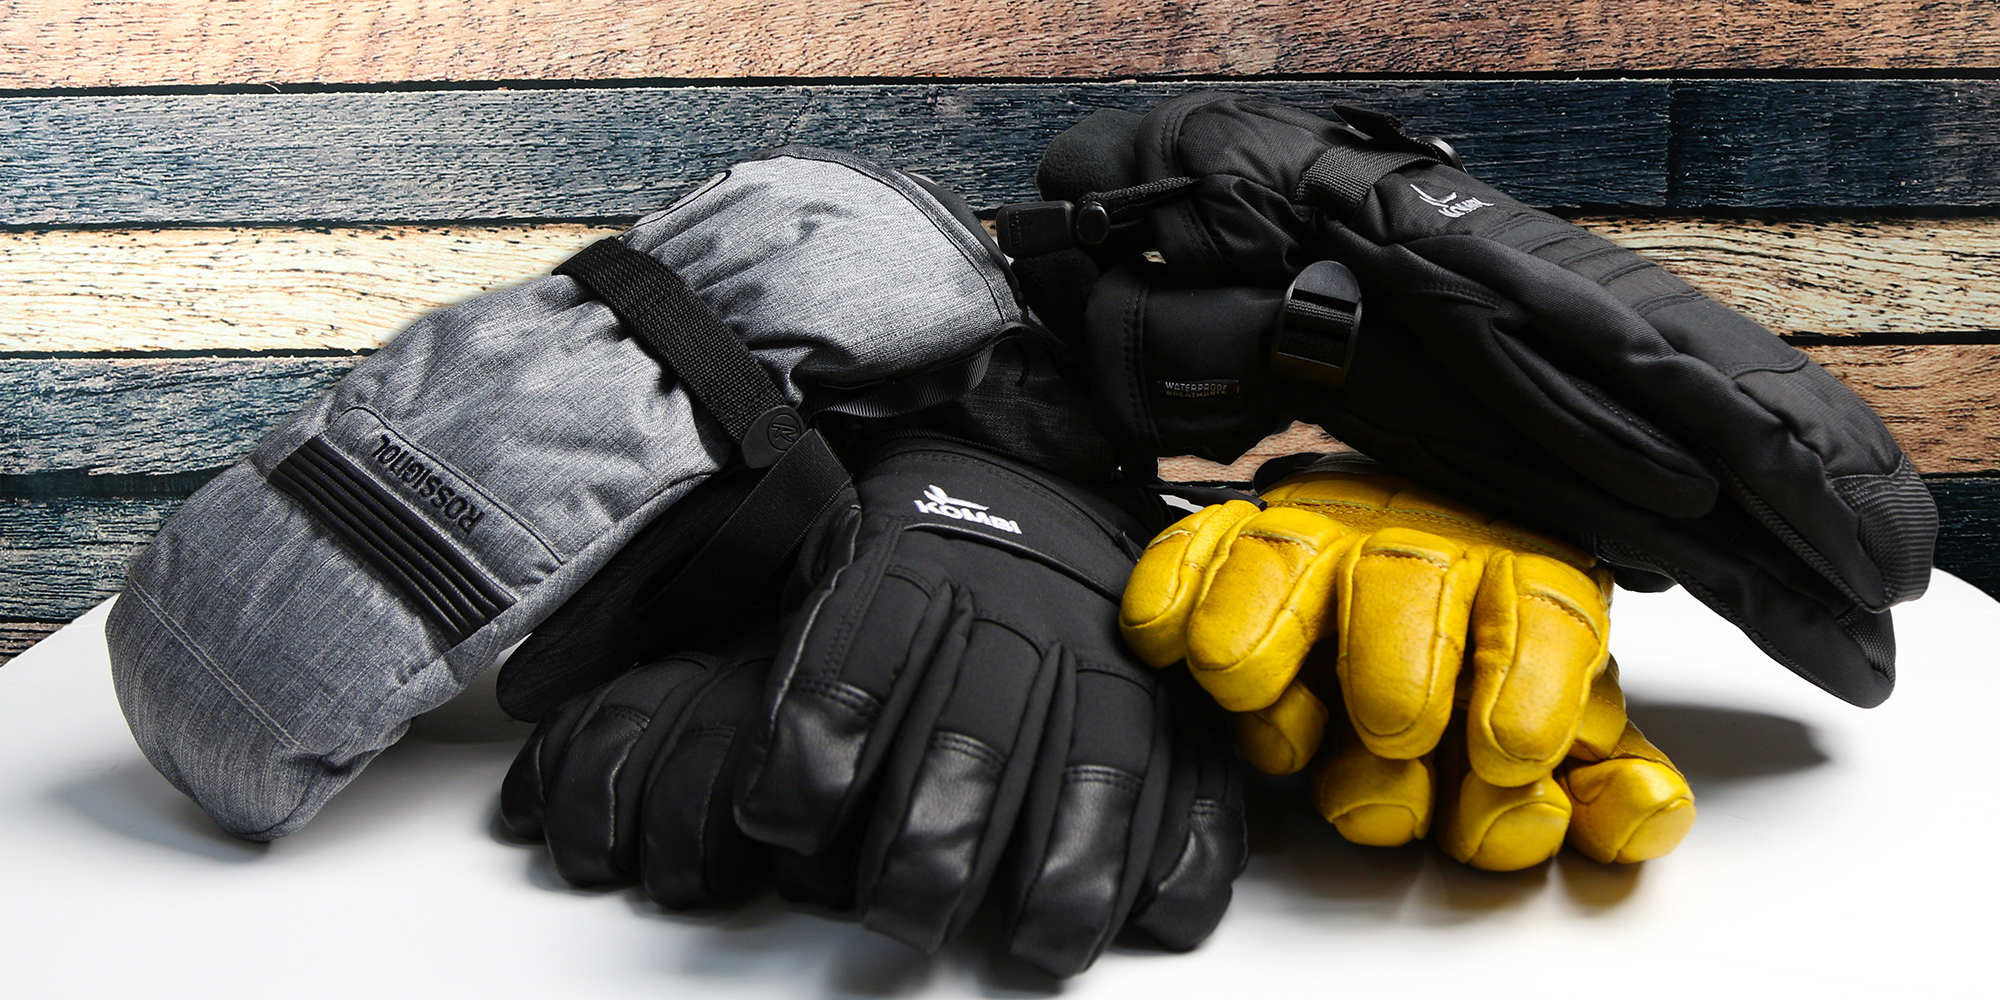 choosing ski gloves